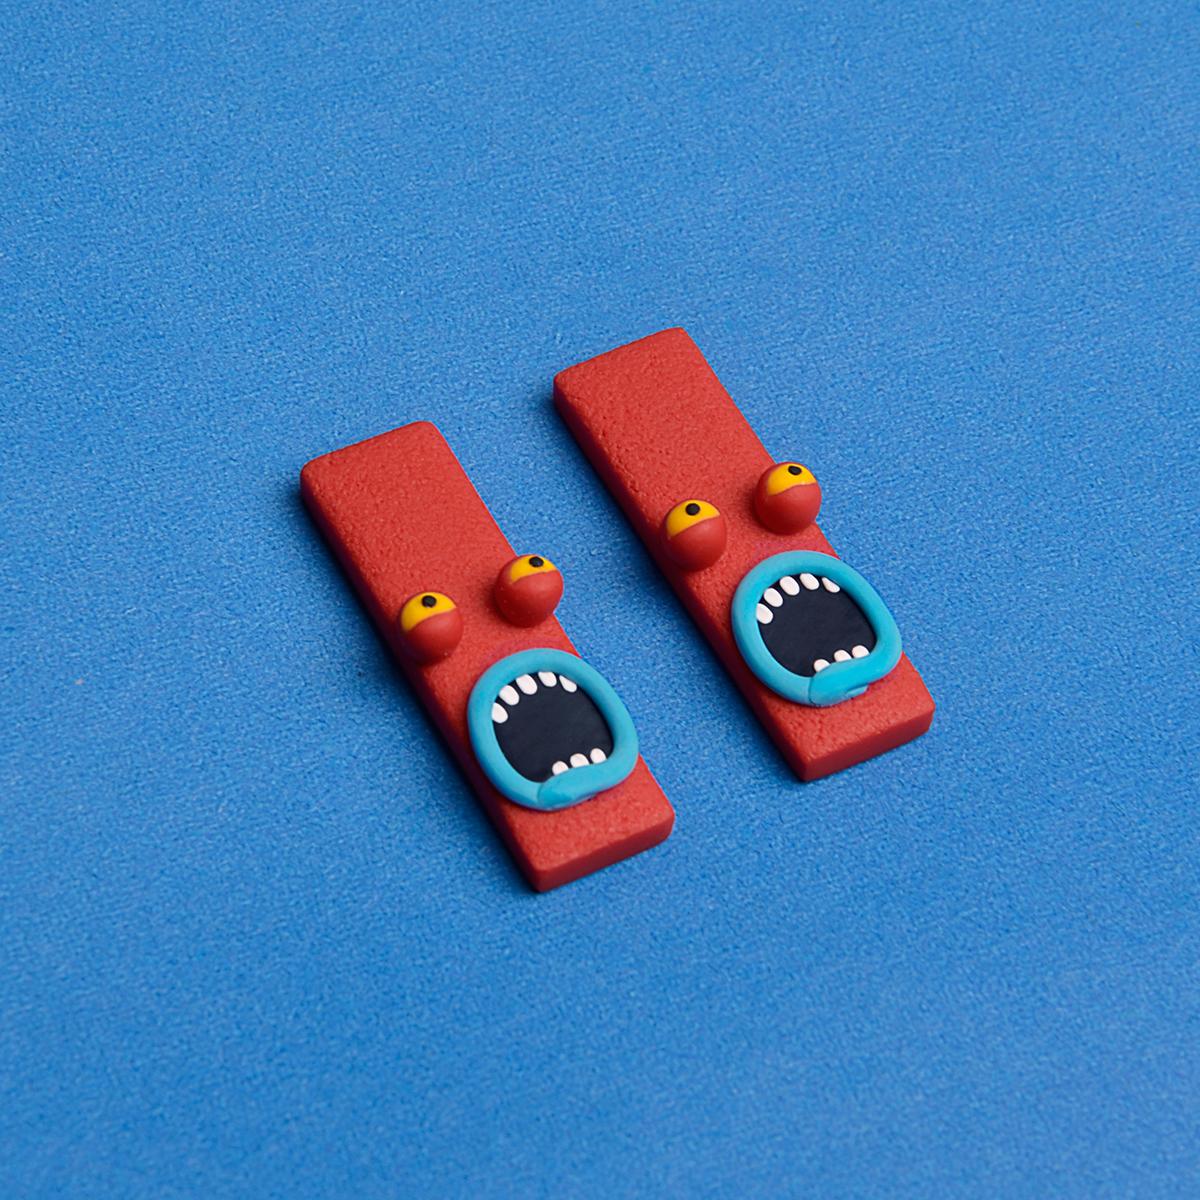 Zhibus original design cartoon funny red monster Earrings Handmade soft clay funny Earrings female earrings clip